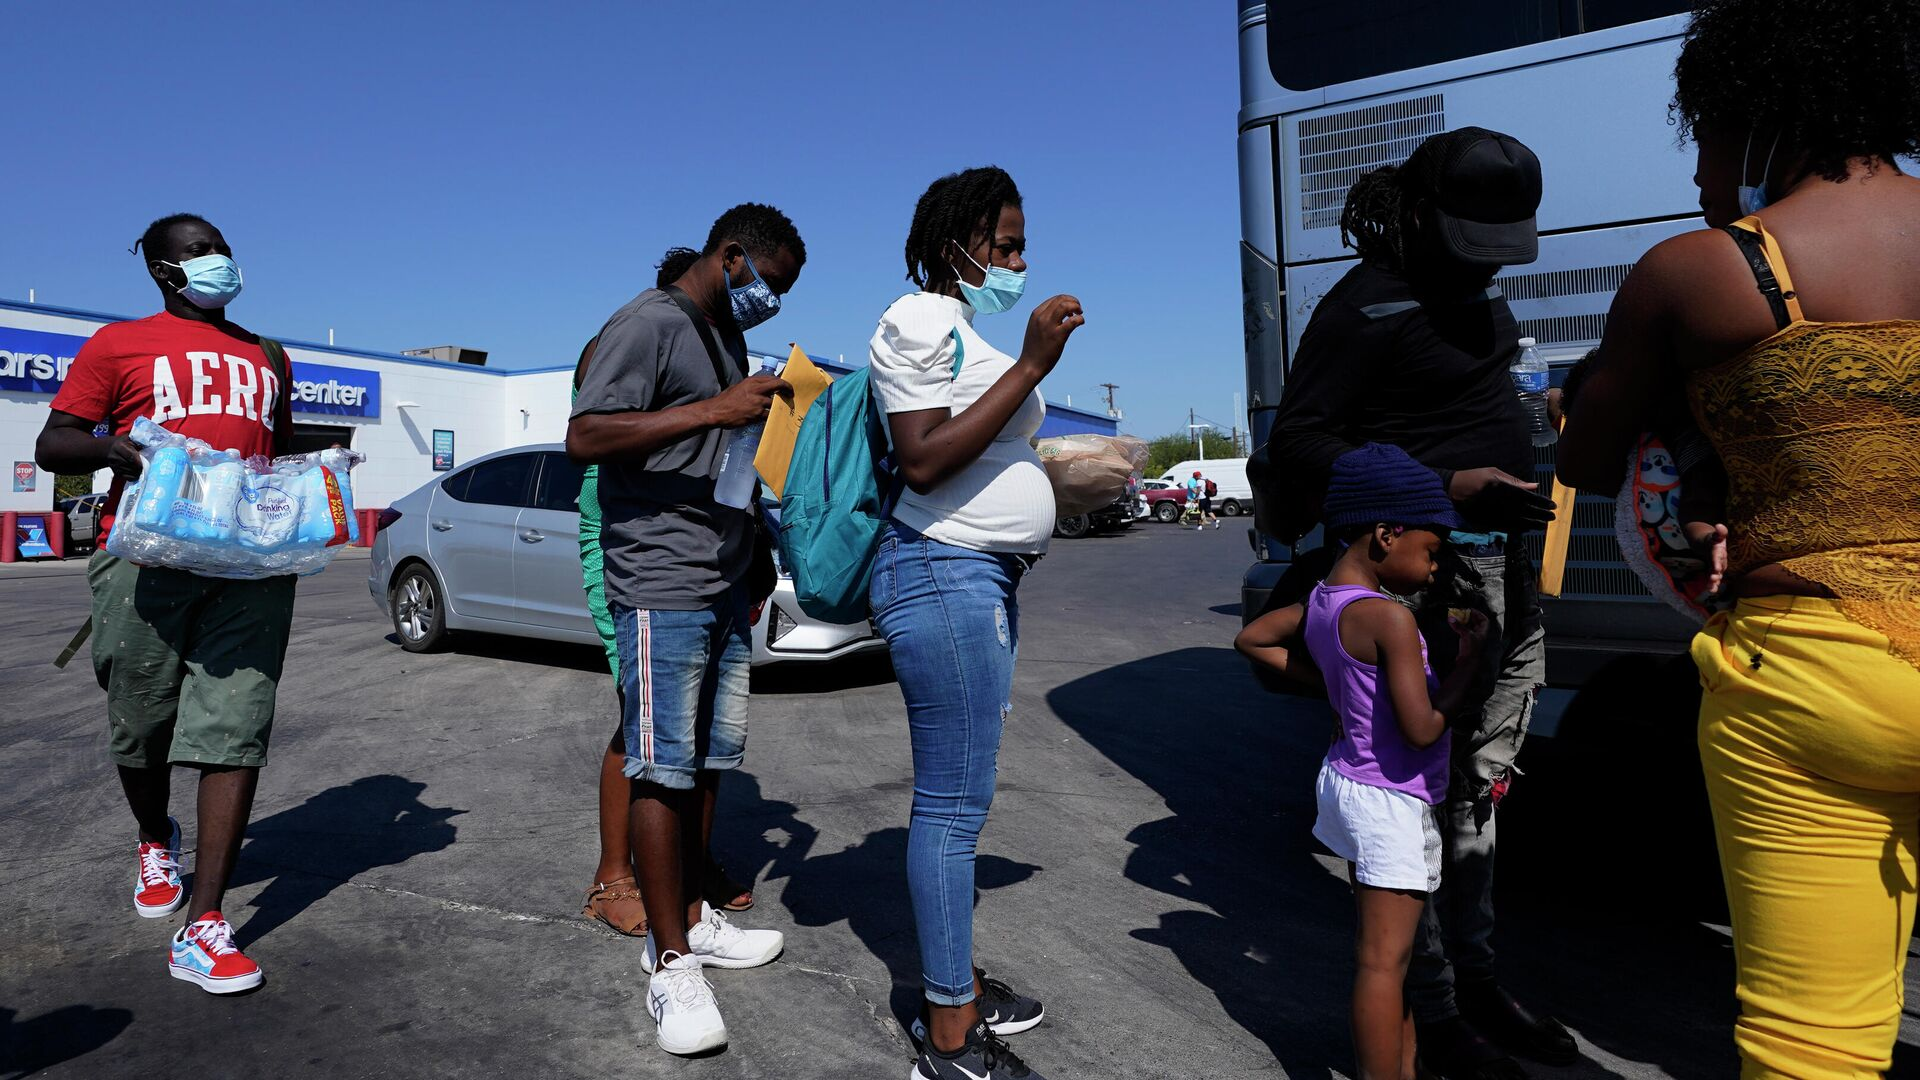 Los haitianos cerca del autobús  - Sputnik Mundo, 1920, 30.09.2021